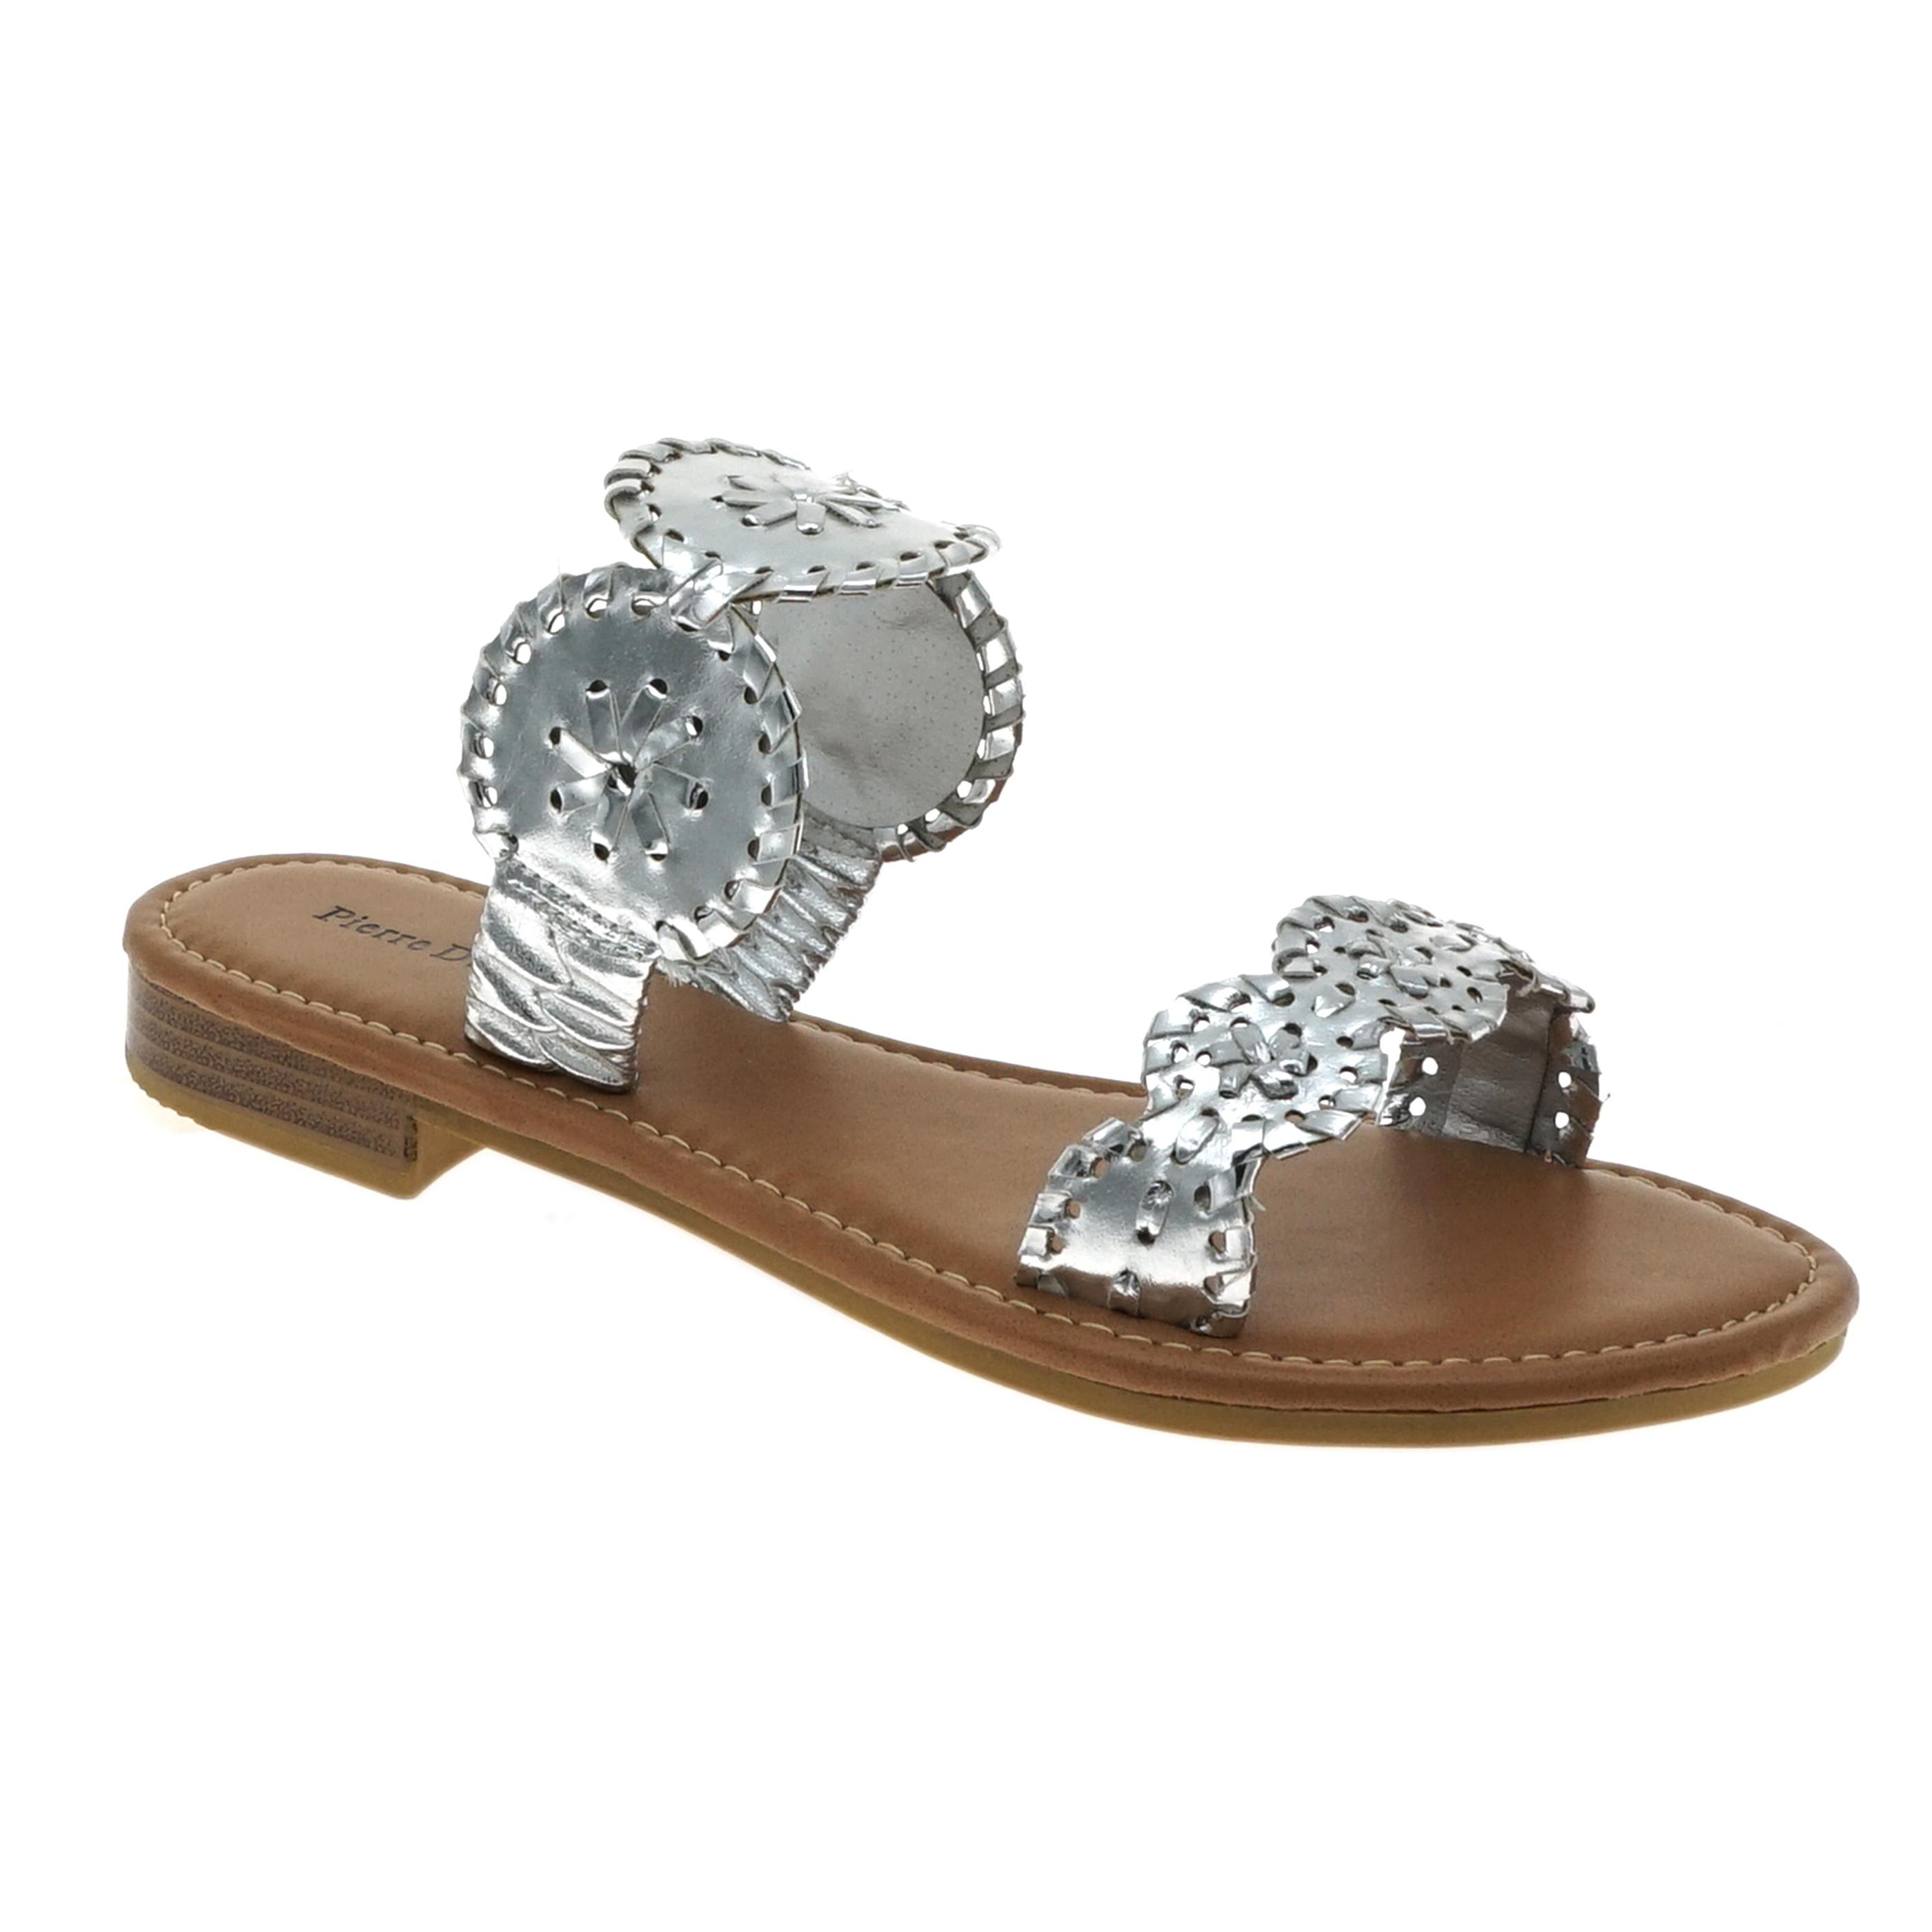 7db210c3d7a3 21258 - ROSETTA-4. Sandals by Pierre Dumas